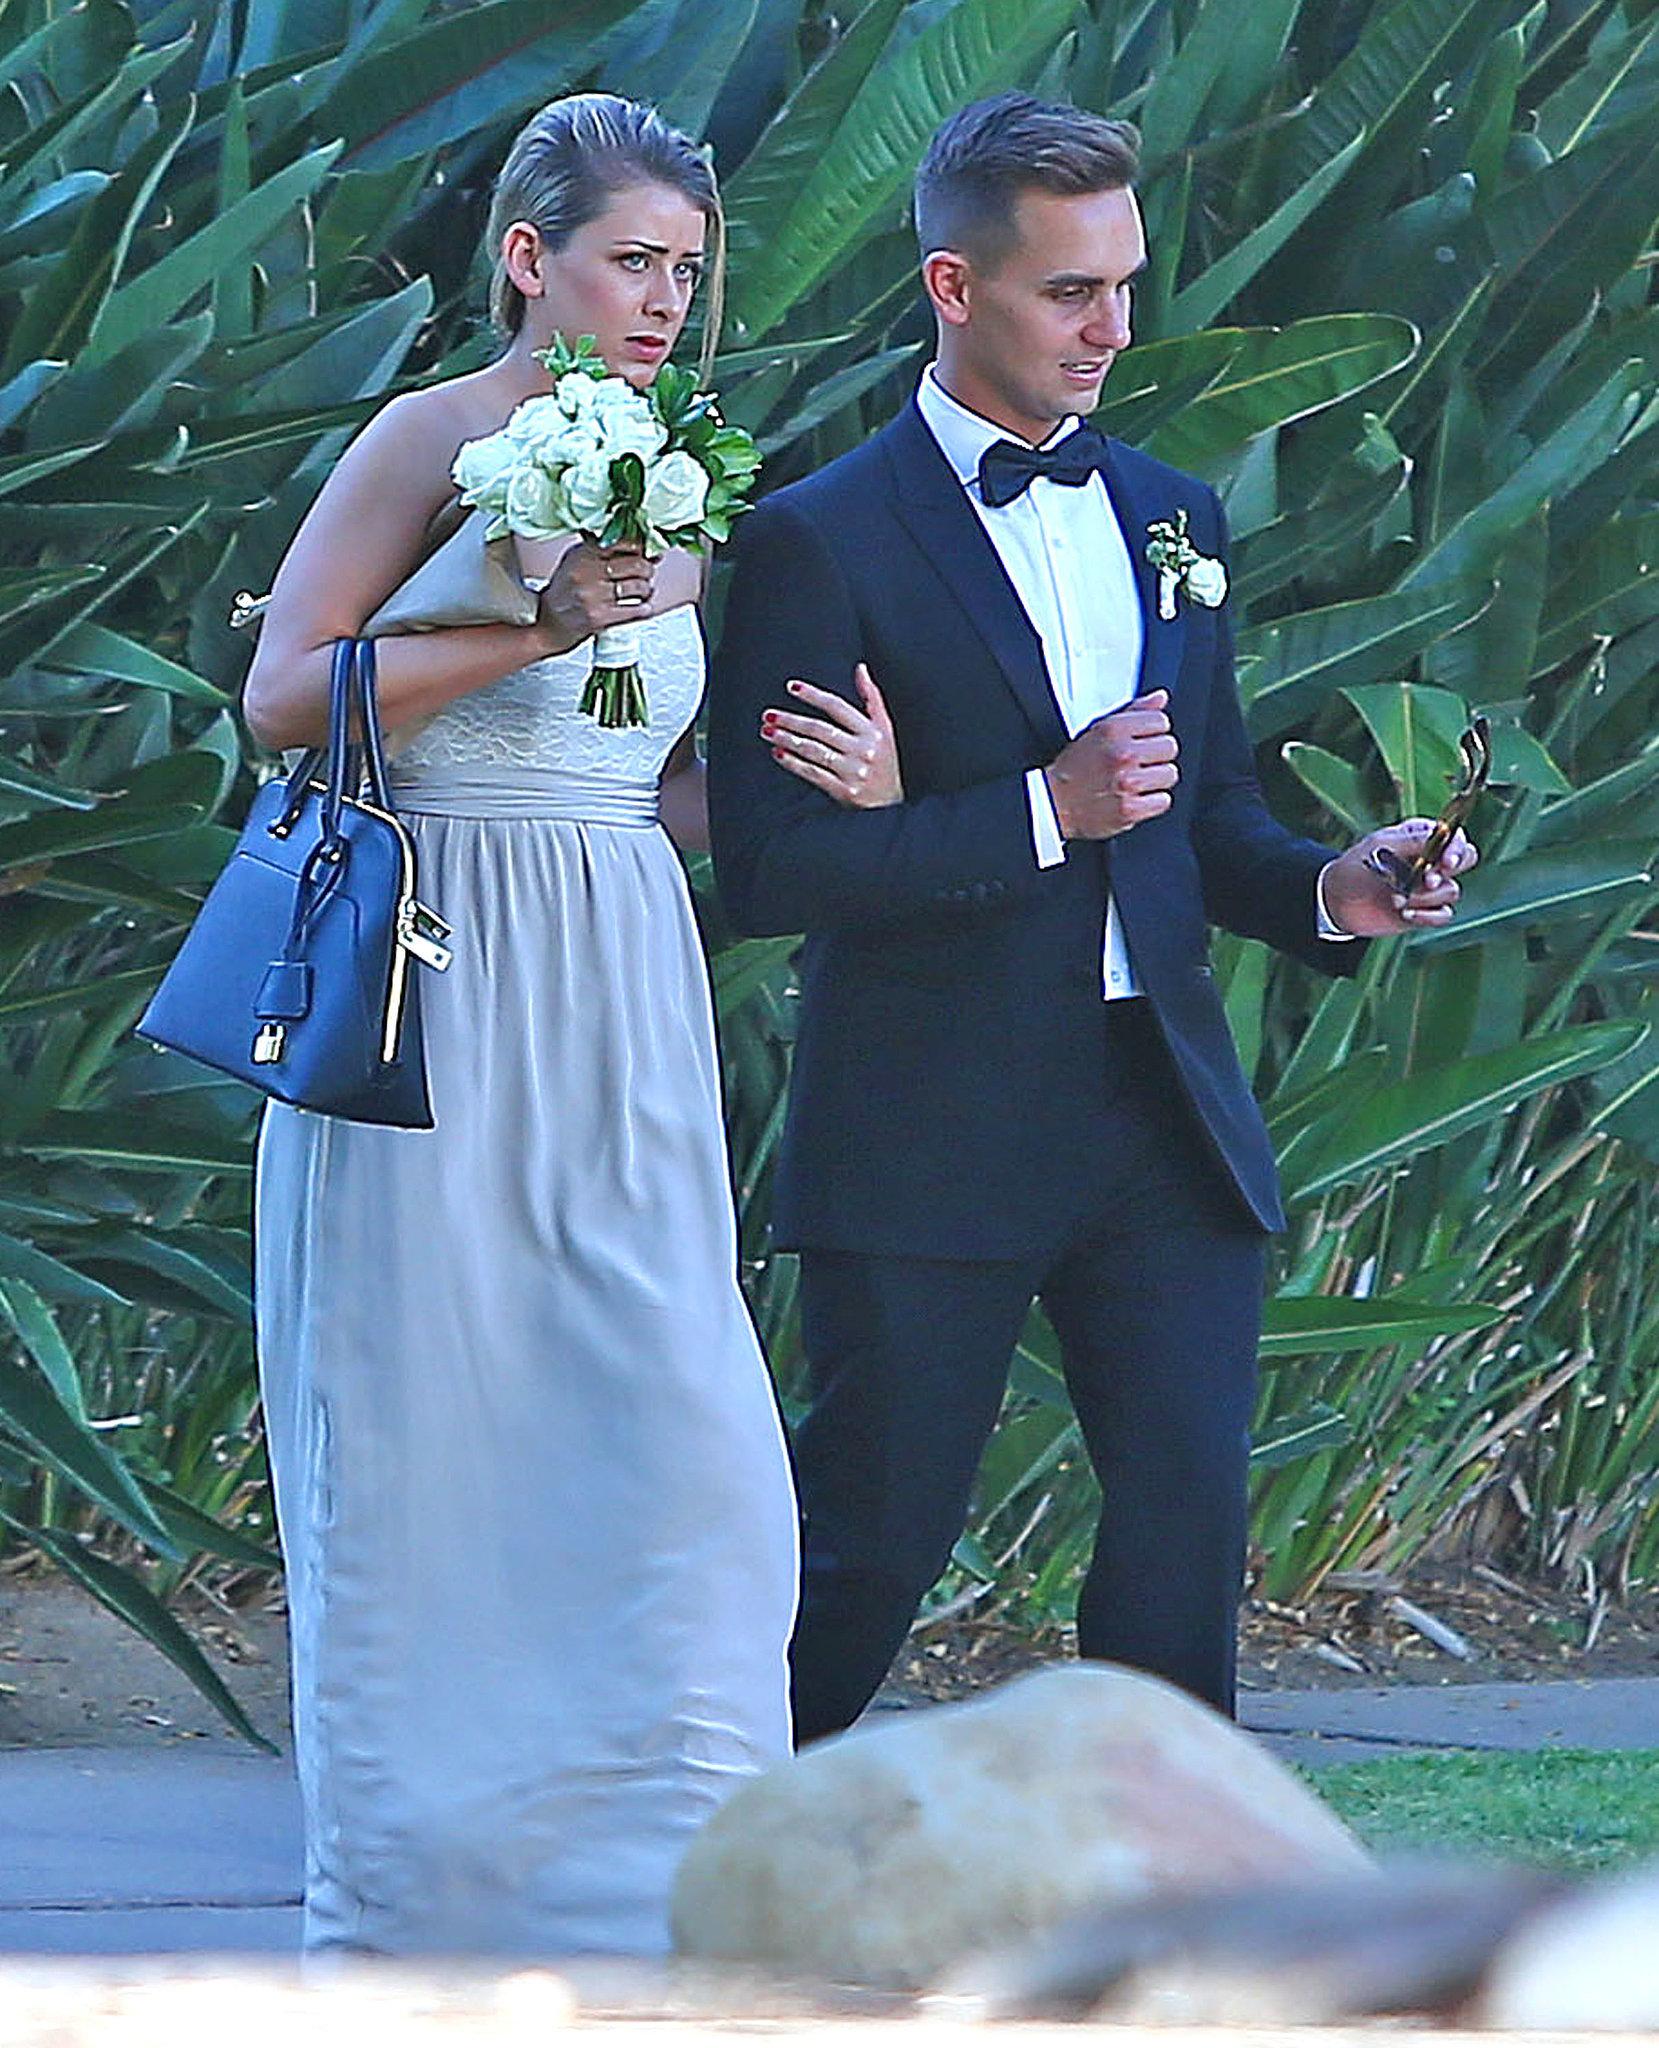 Lauren Conrad and Lo Bosworth Team Up as Bridesmaids!